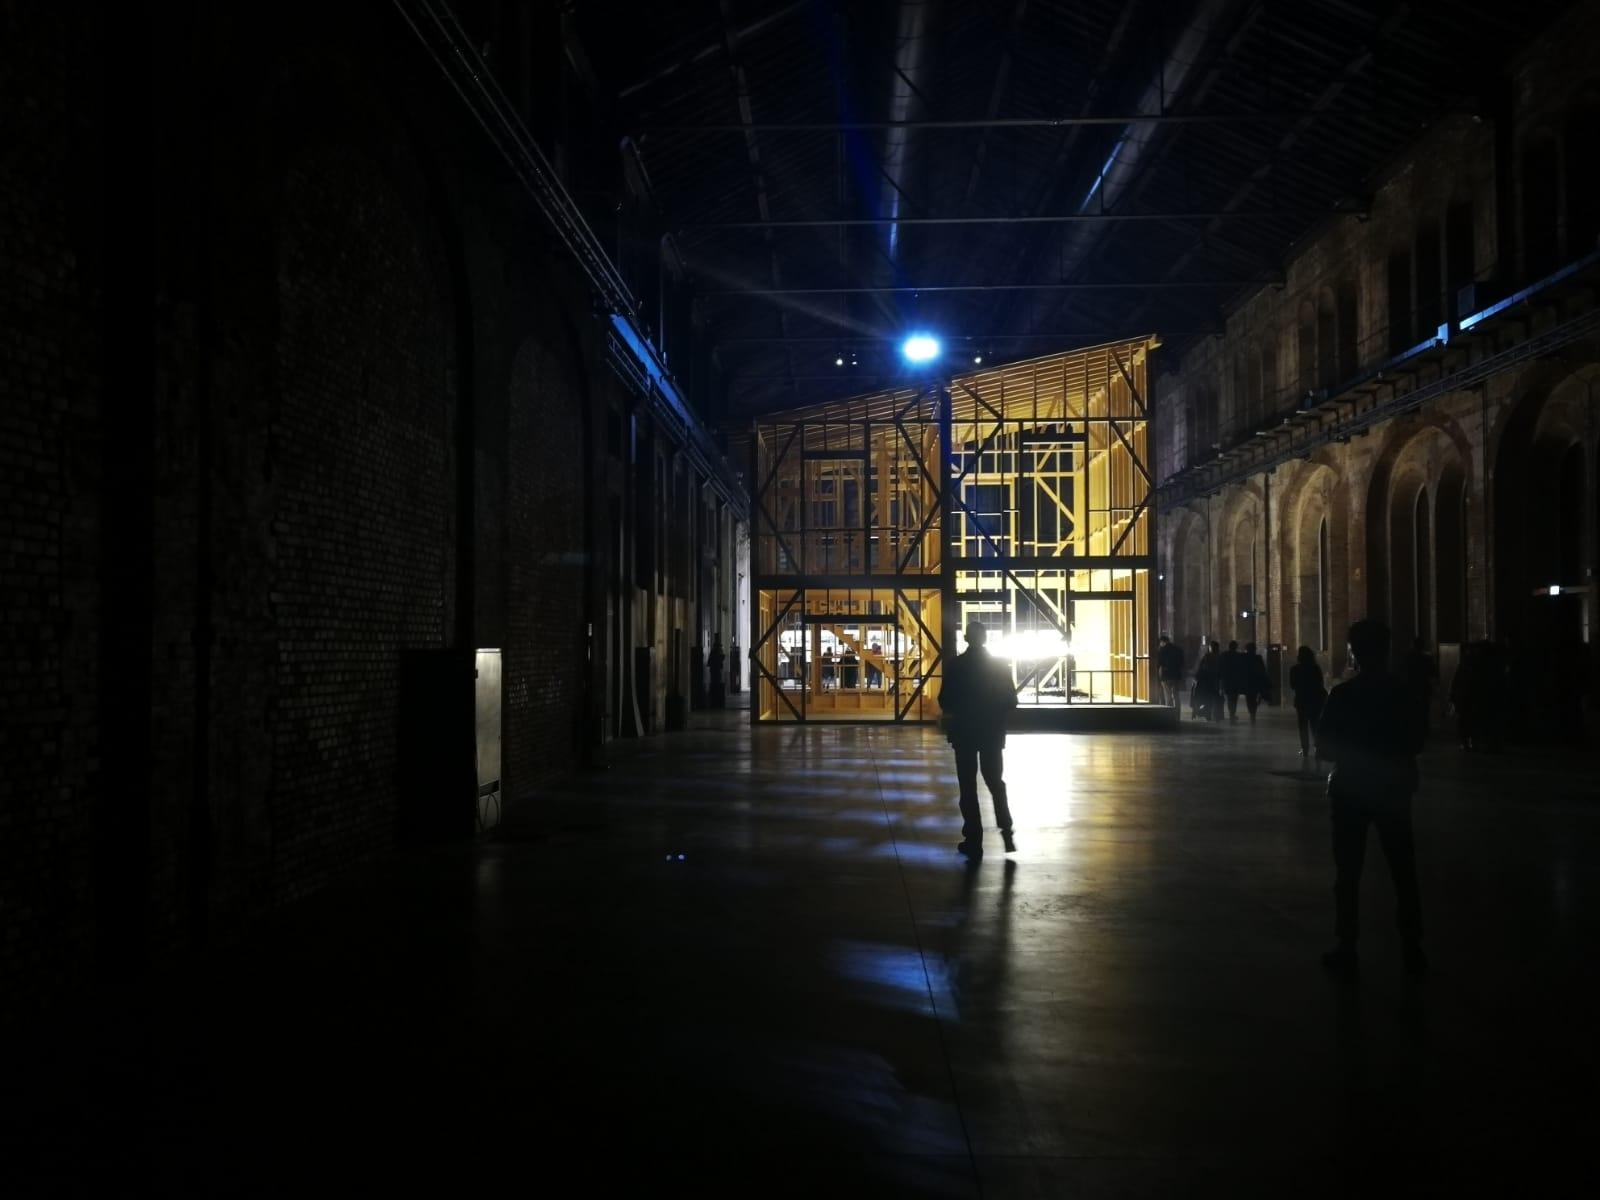 As Walls Keep Shifting, OGR (Officine Grandi Riparazioni) di Torino